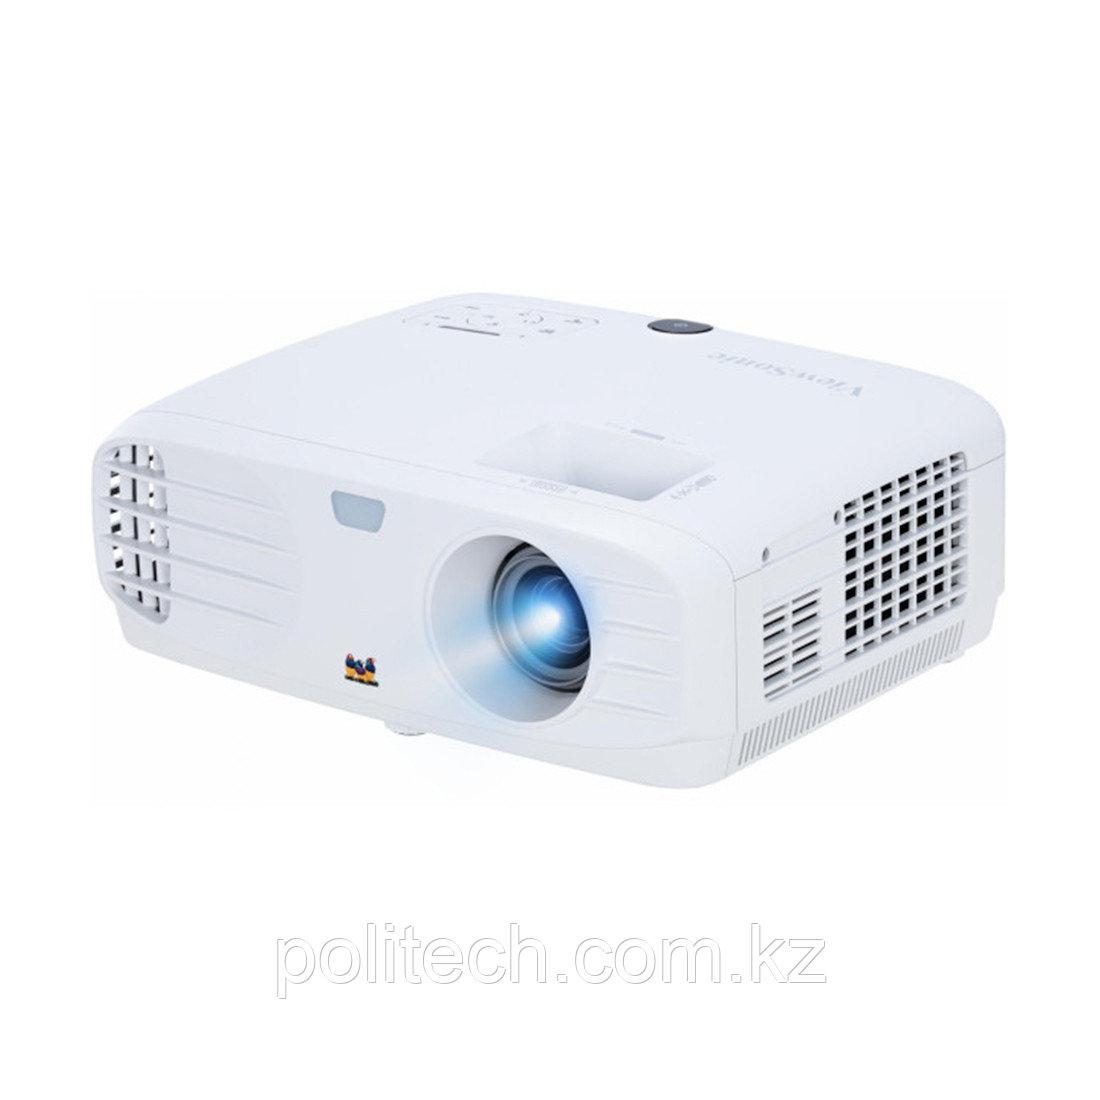 Проектор ViewSonic PG705HD, 1920x1200, 4000 люмен